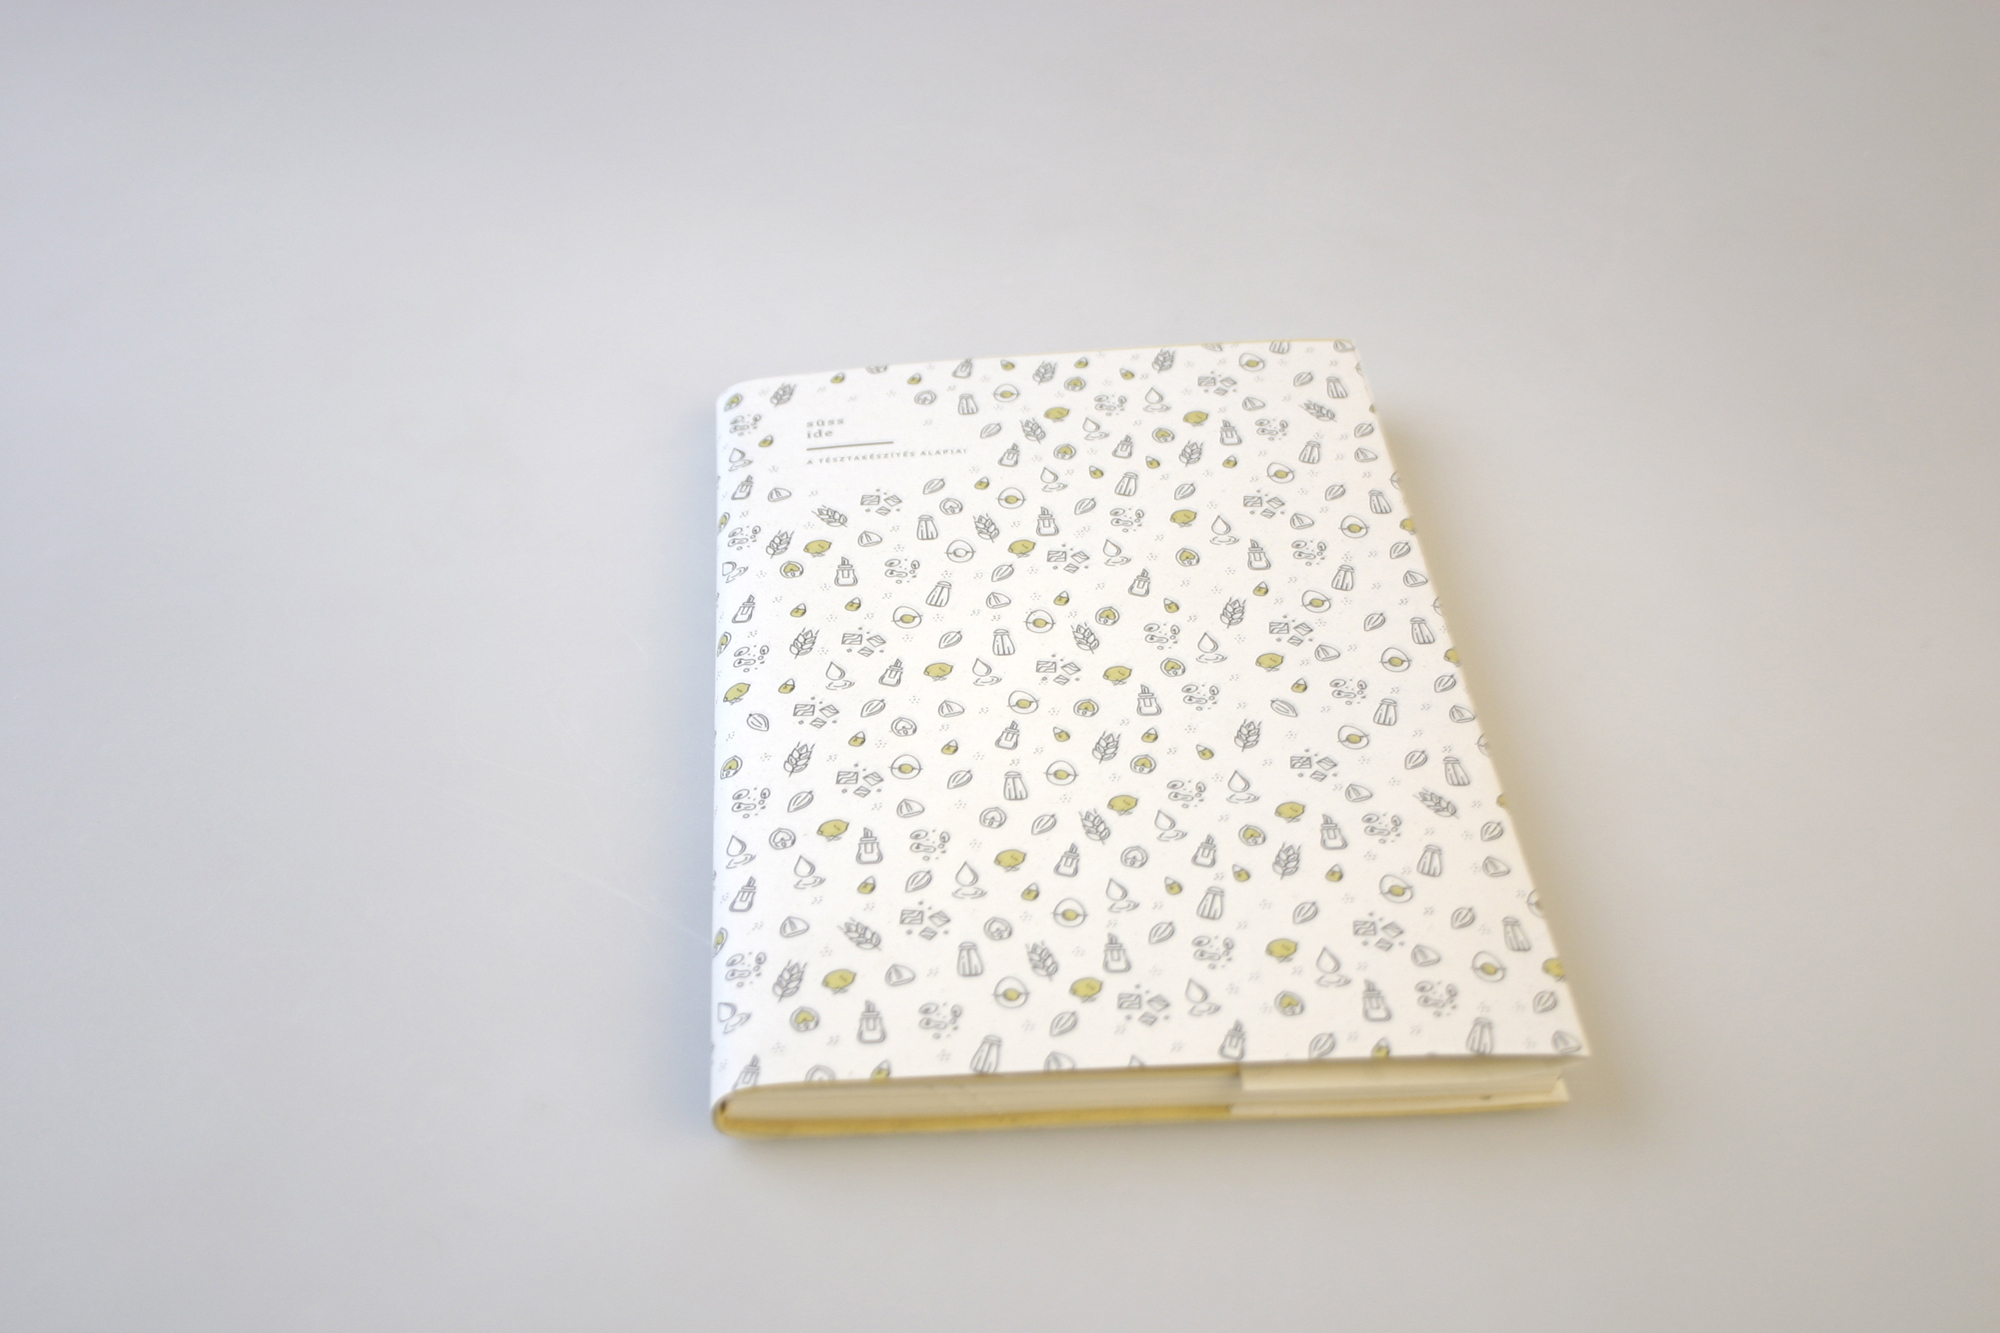 rosta emese receipt-book 06.jpg